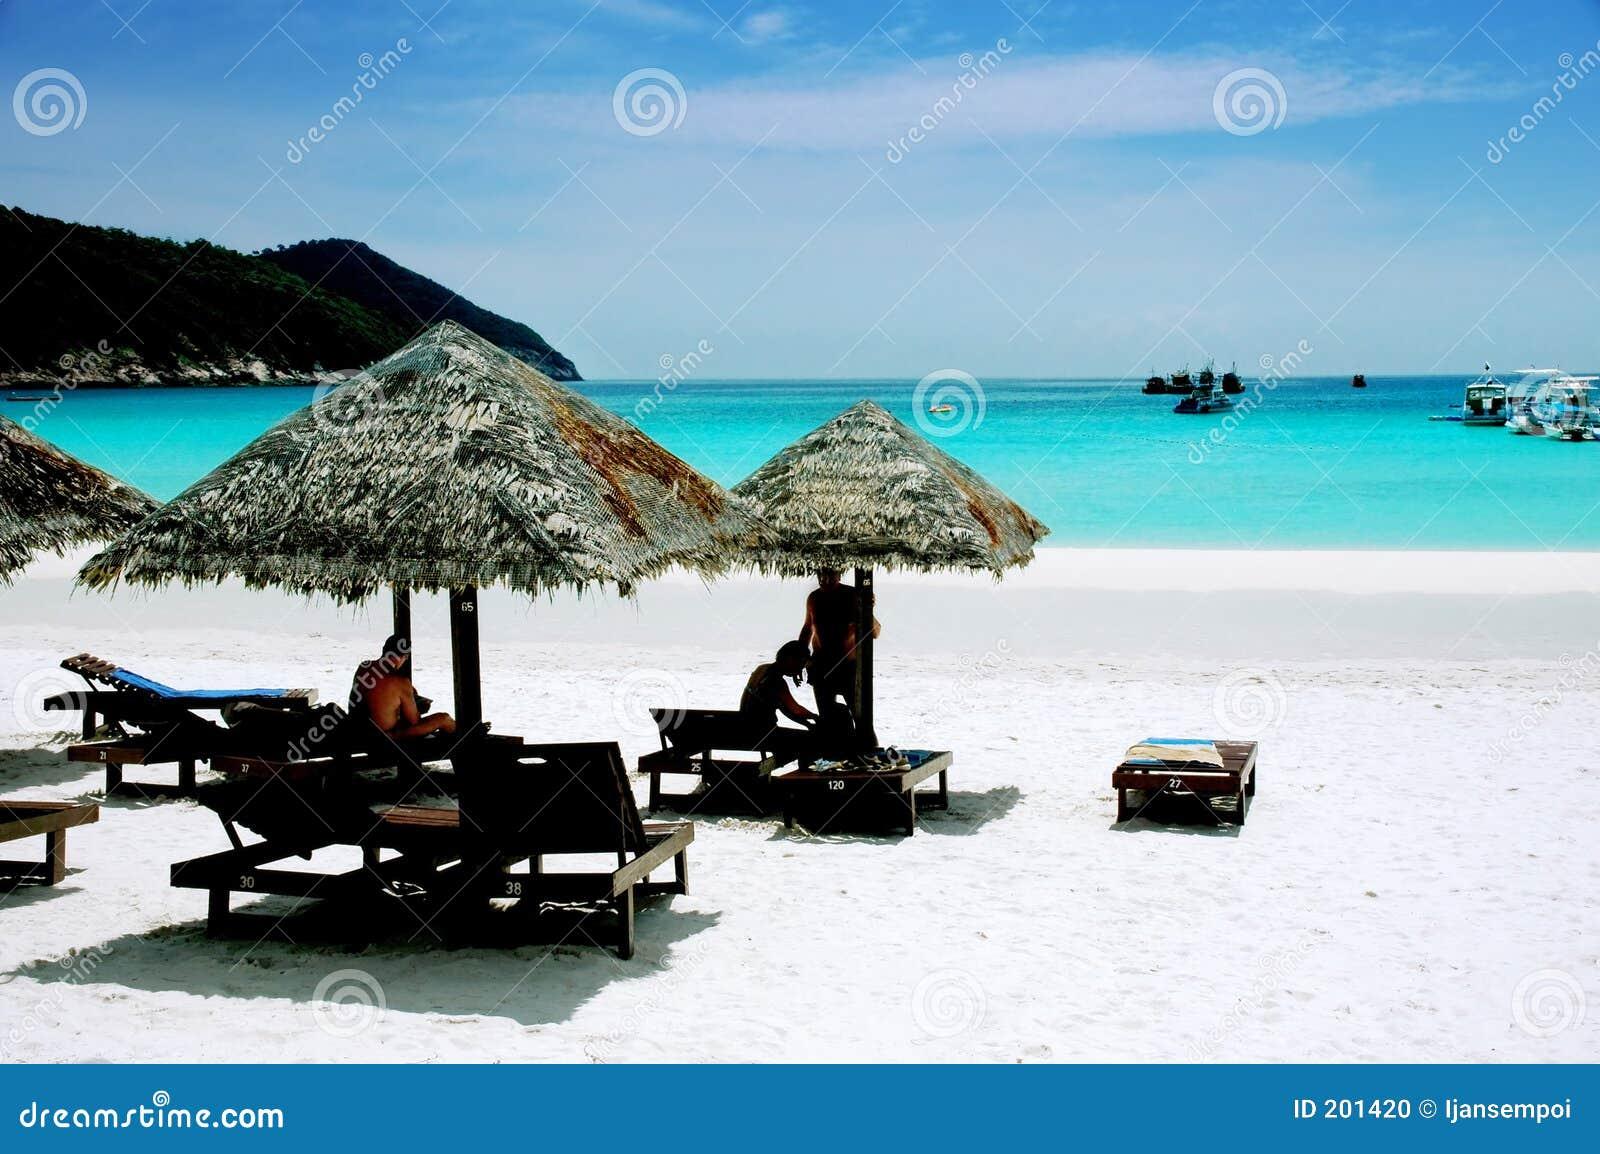 Peaceful Beach Scenery Stock Photo Image 201420